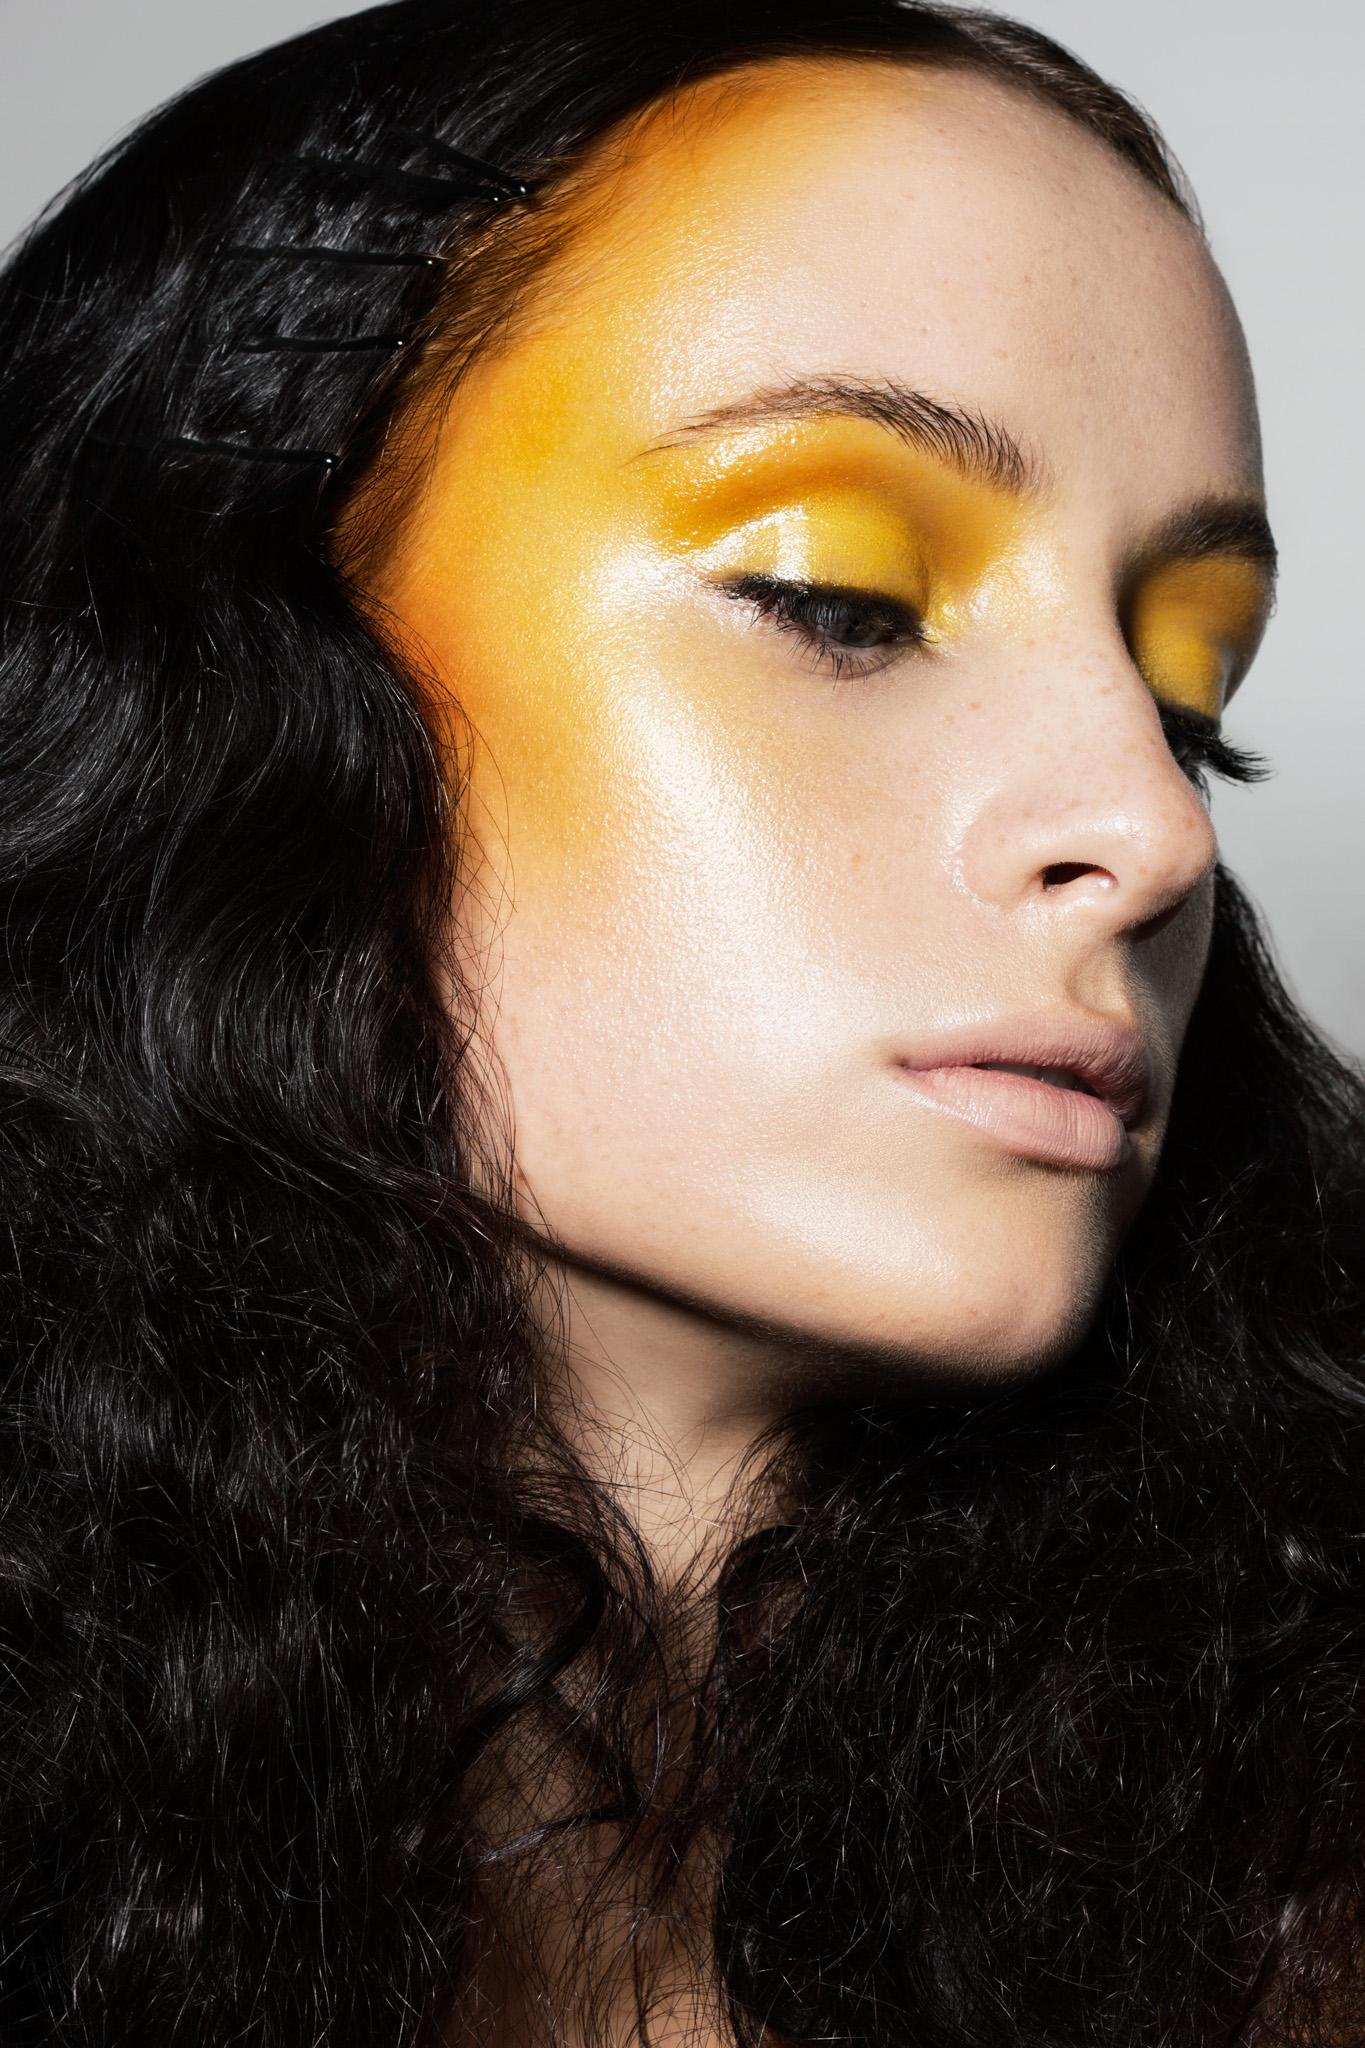 Zemira - Photographer: Elizabeth Maleevski @Illuminate ManagementModel: Zemira Whitehead @Quemodels